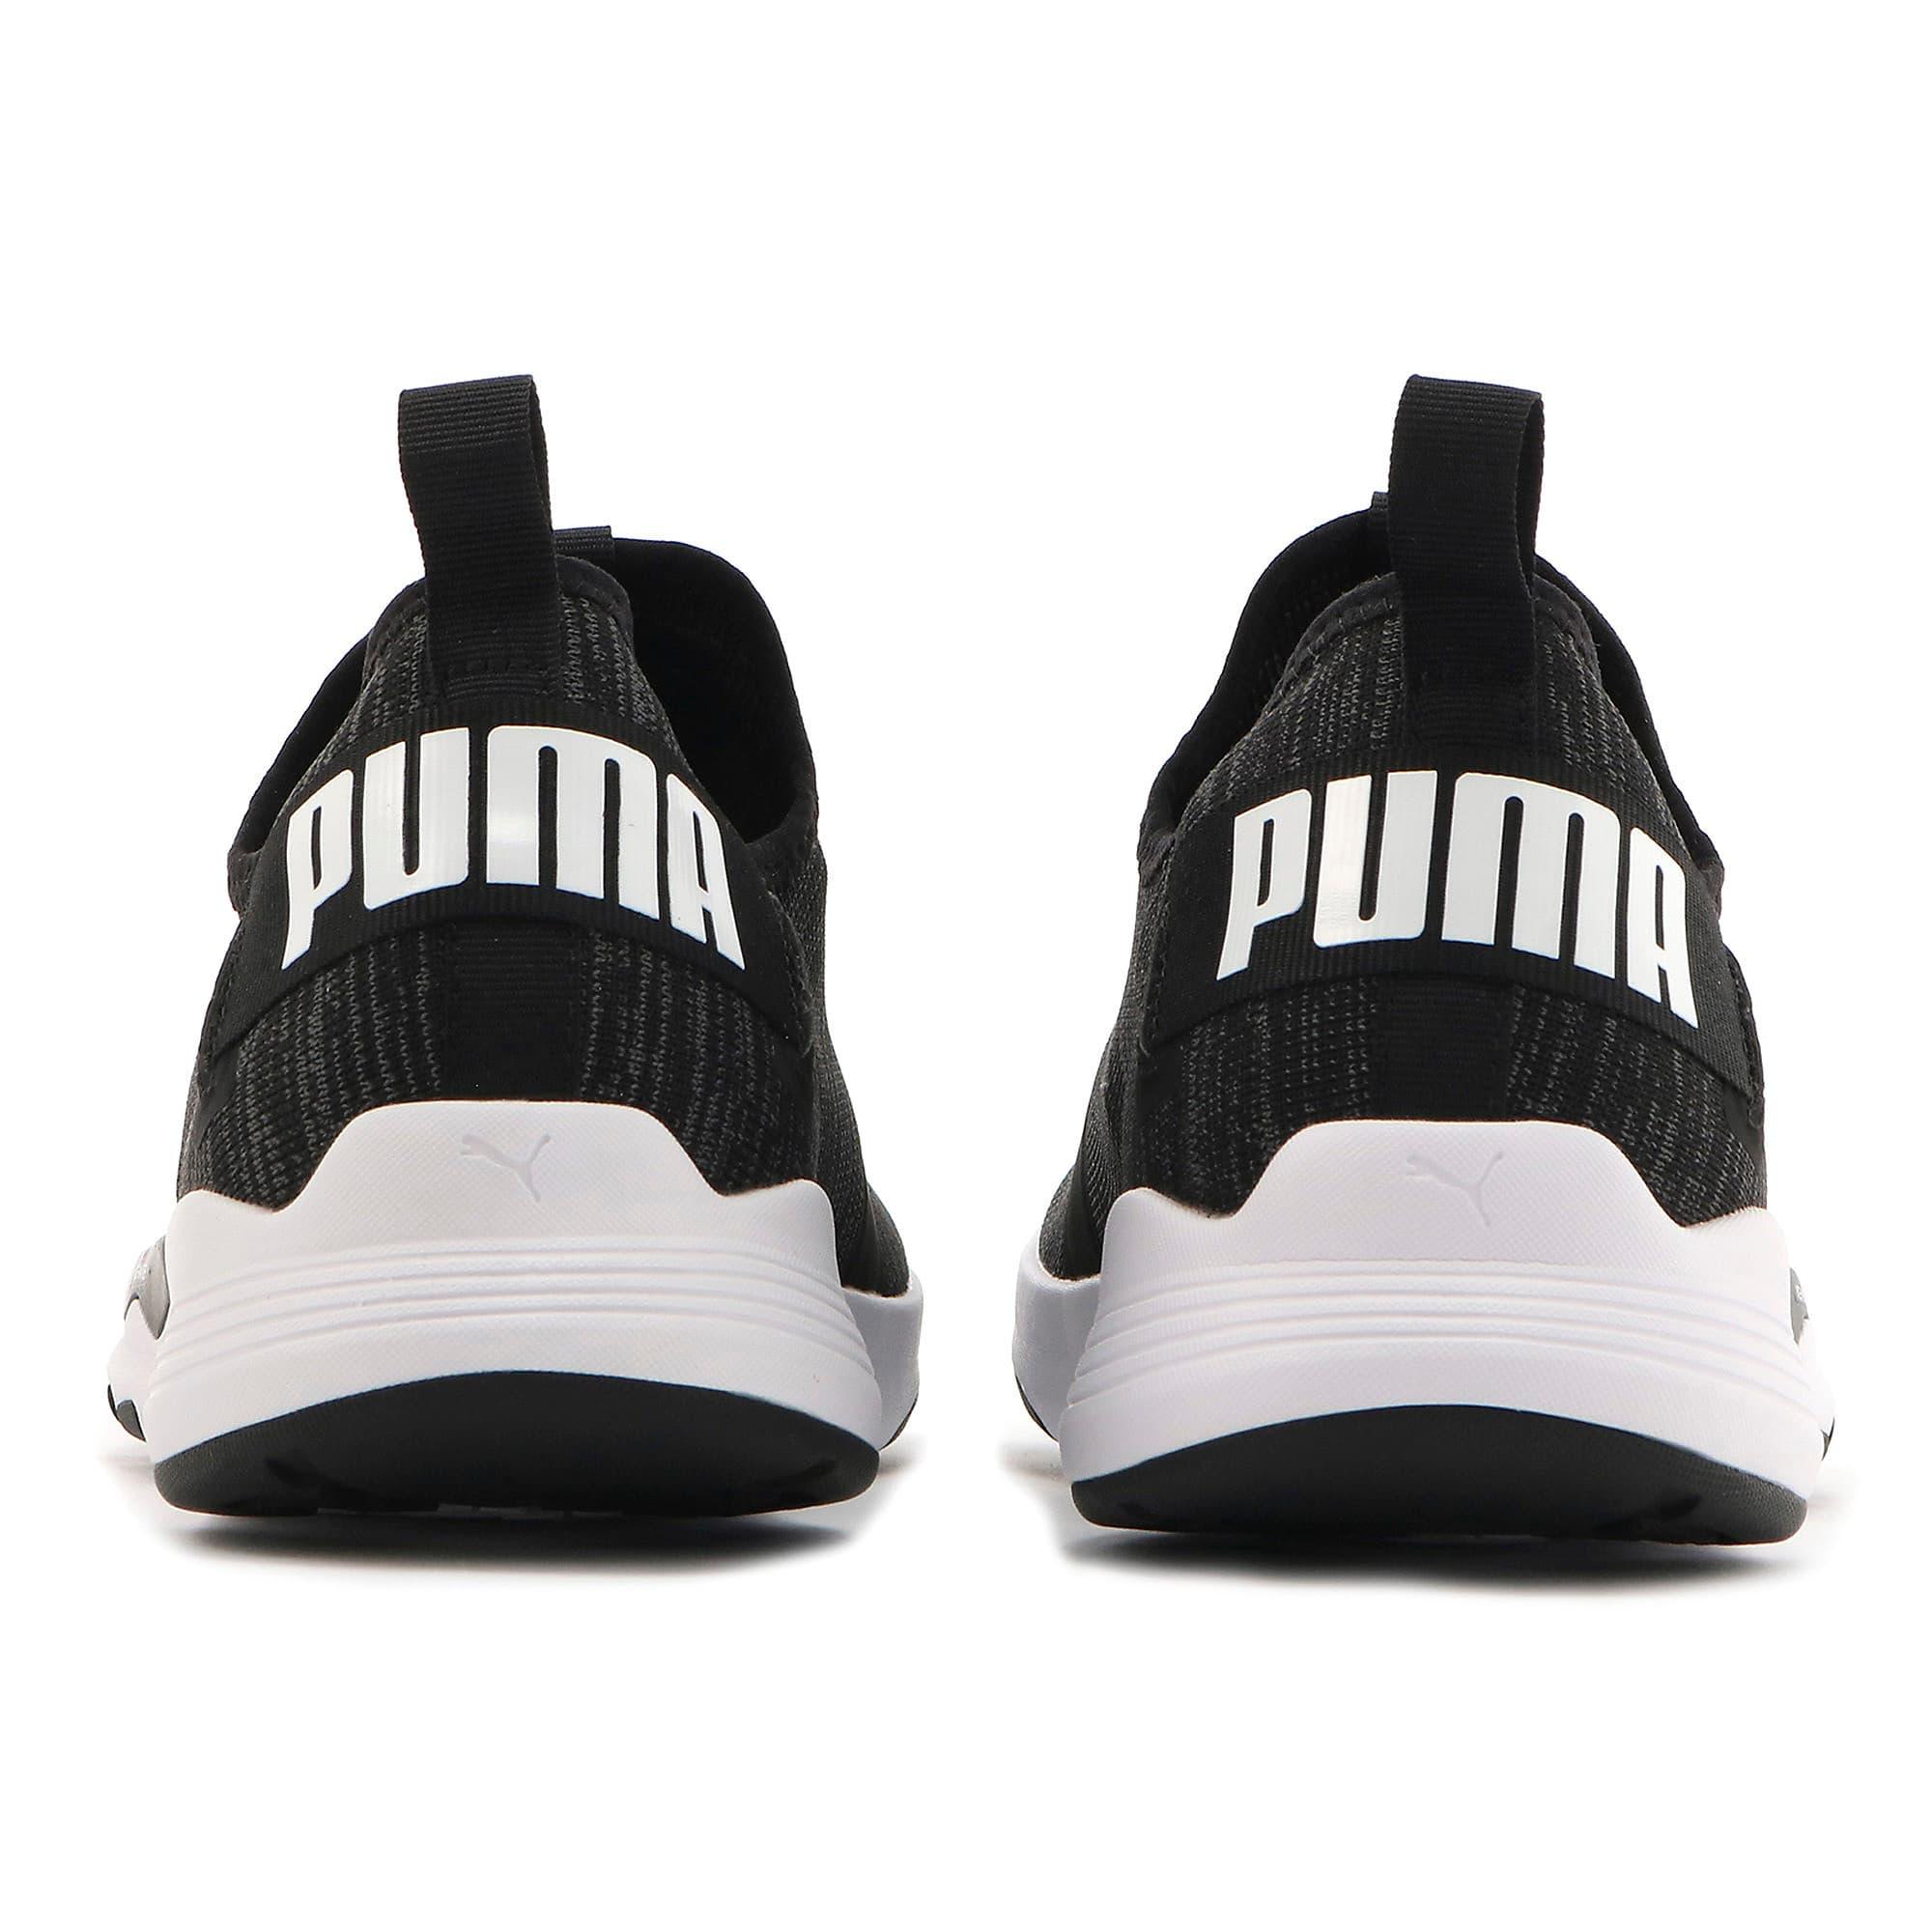 Thumbnail 4 of プーマ イグナイト コンテンダーニット, Puma Black-Puma White, medium-JPN